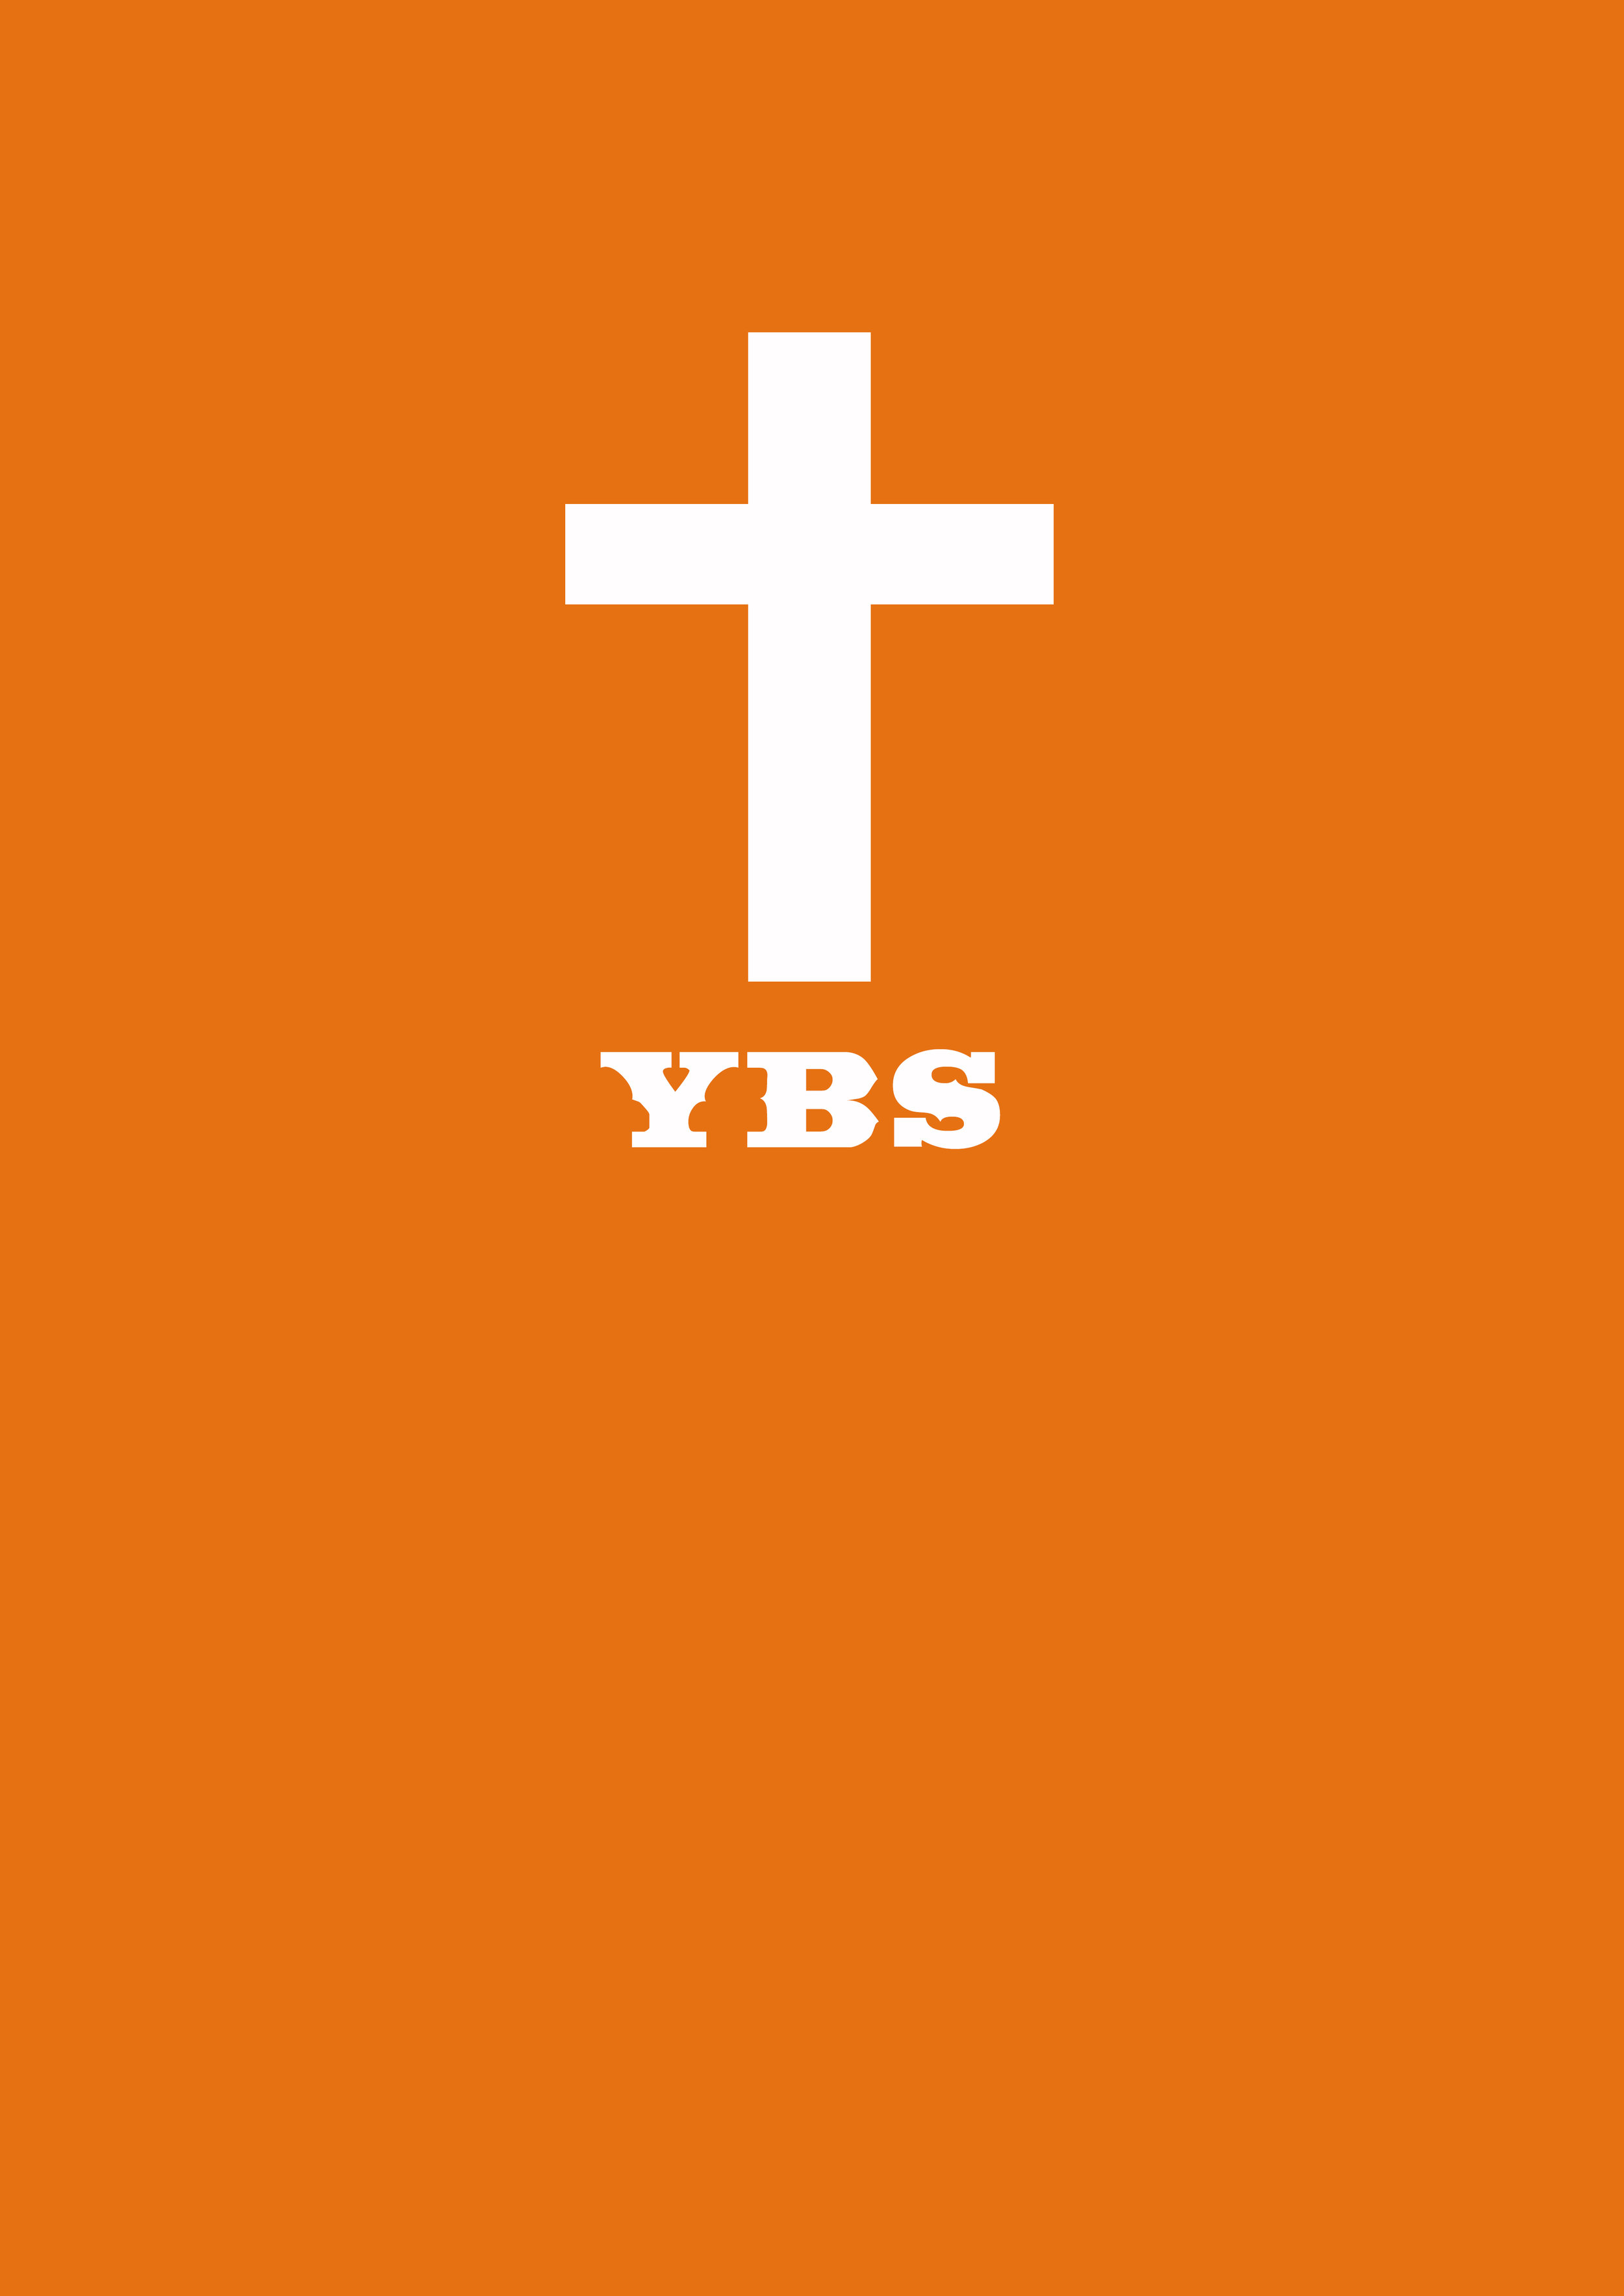 YBS.jpg